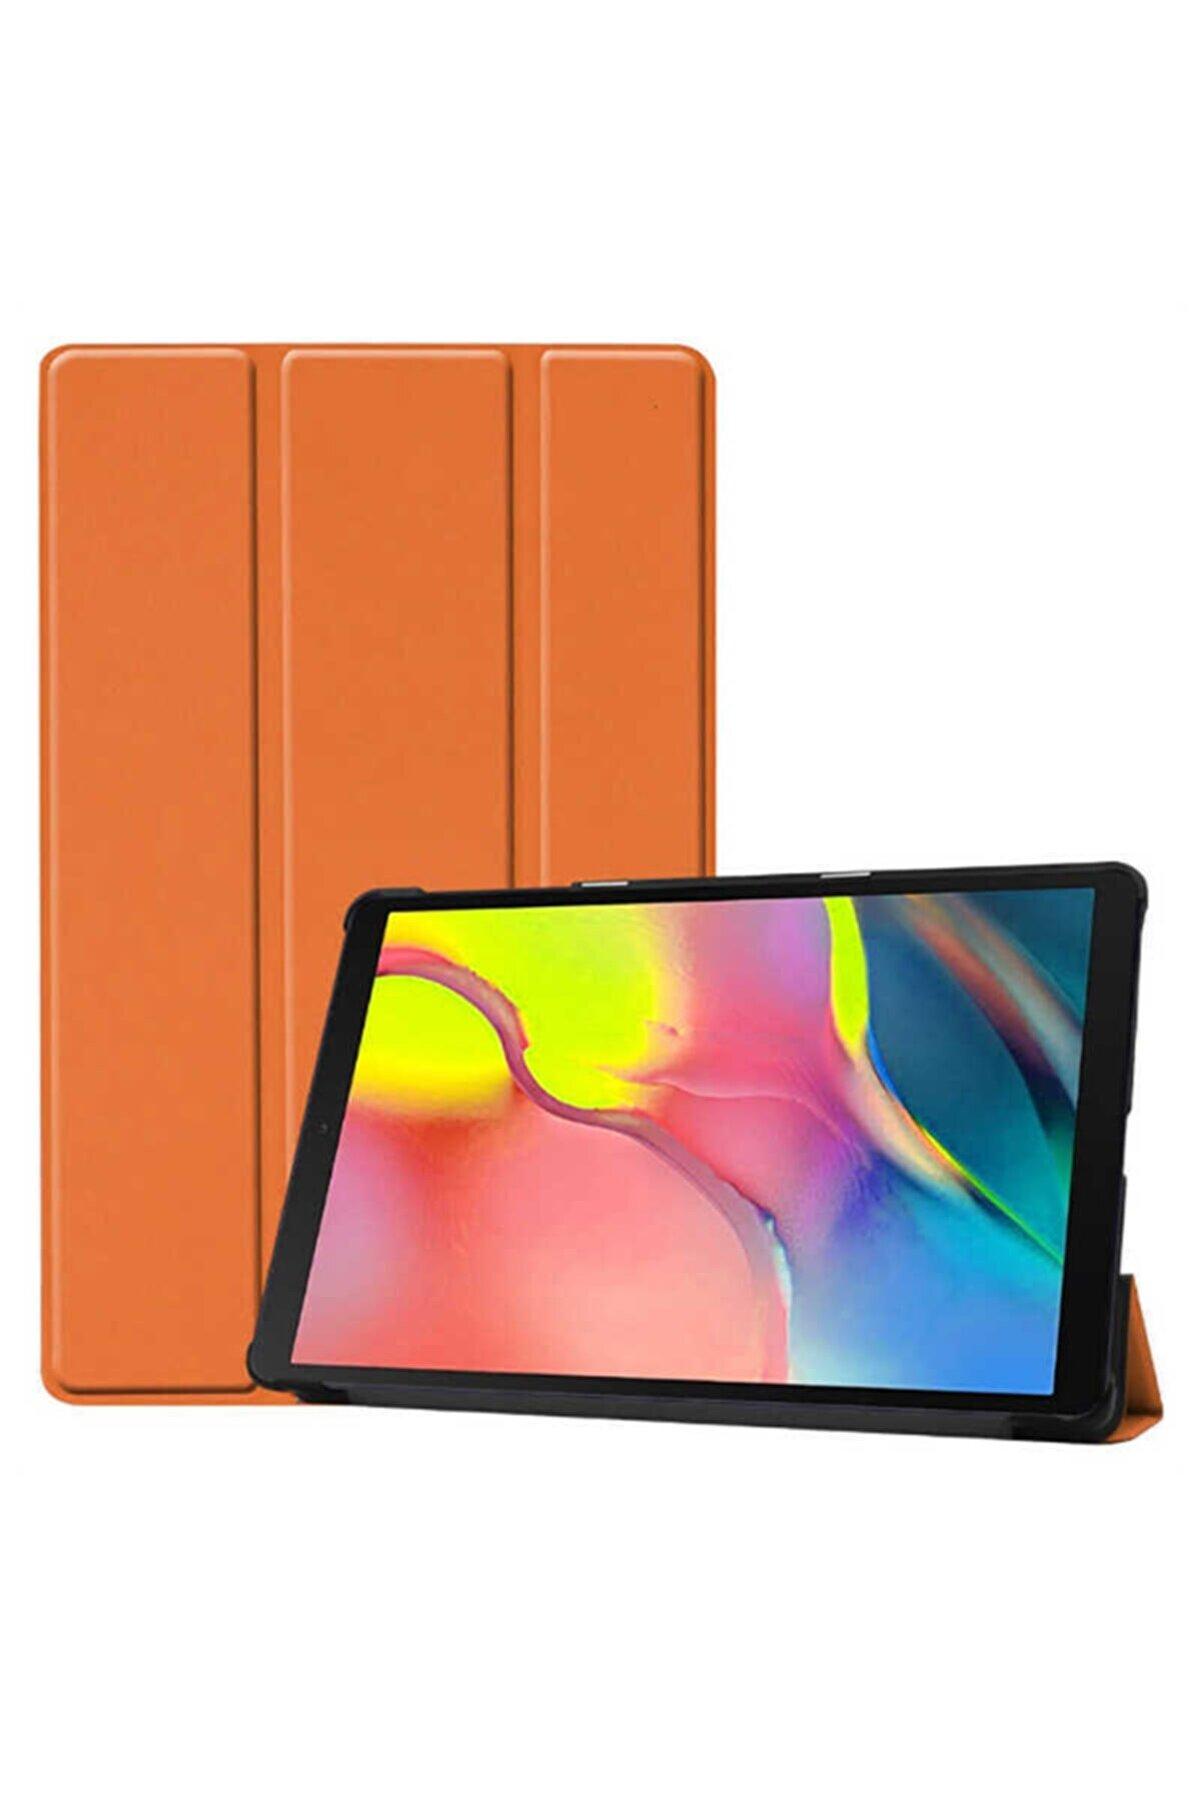 Samsung Galaxy Tab A T290 8 Inç Uyumlu Luxury Pu Leather Flip Stand Tablet Cover Nezih Case Tablet Kılıfı